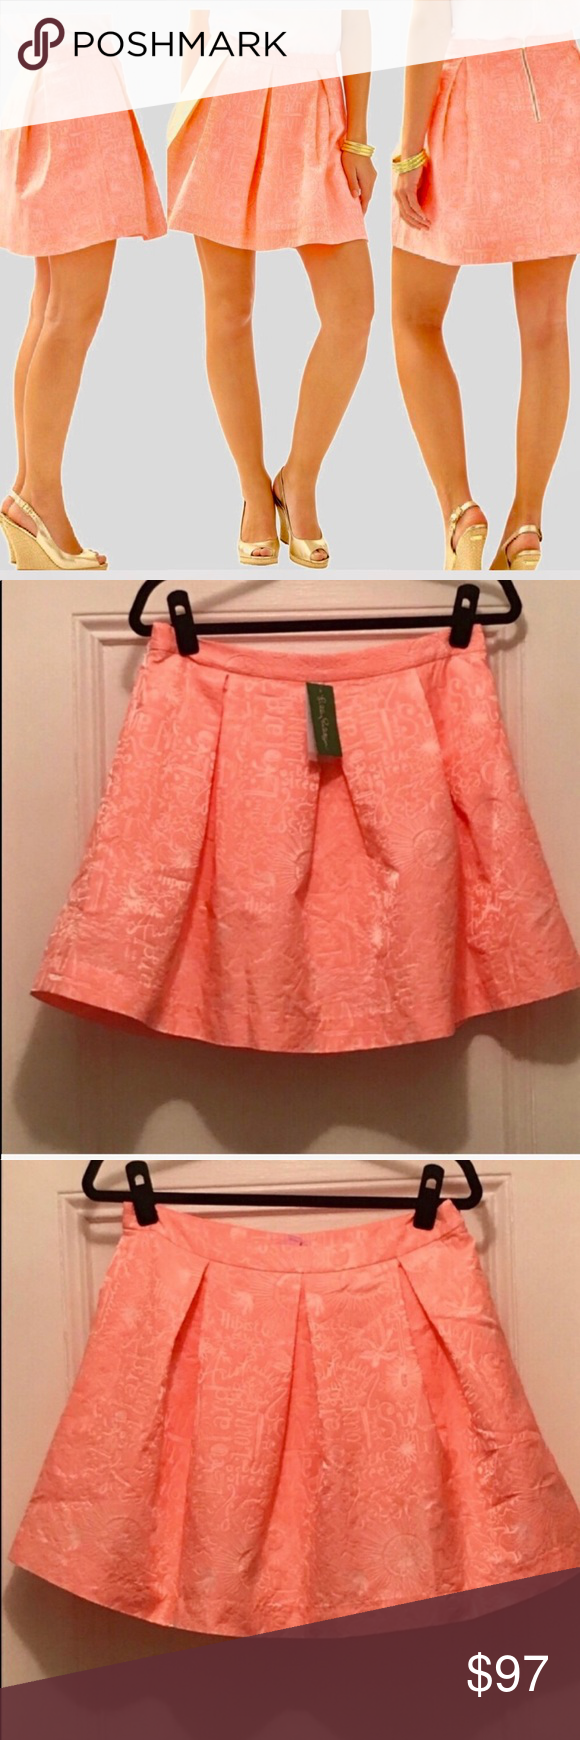 b4552a78af6 LP Peachy Pink Word Street Jacquard Harlie Skirt Lilly Pulitzer ...